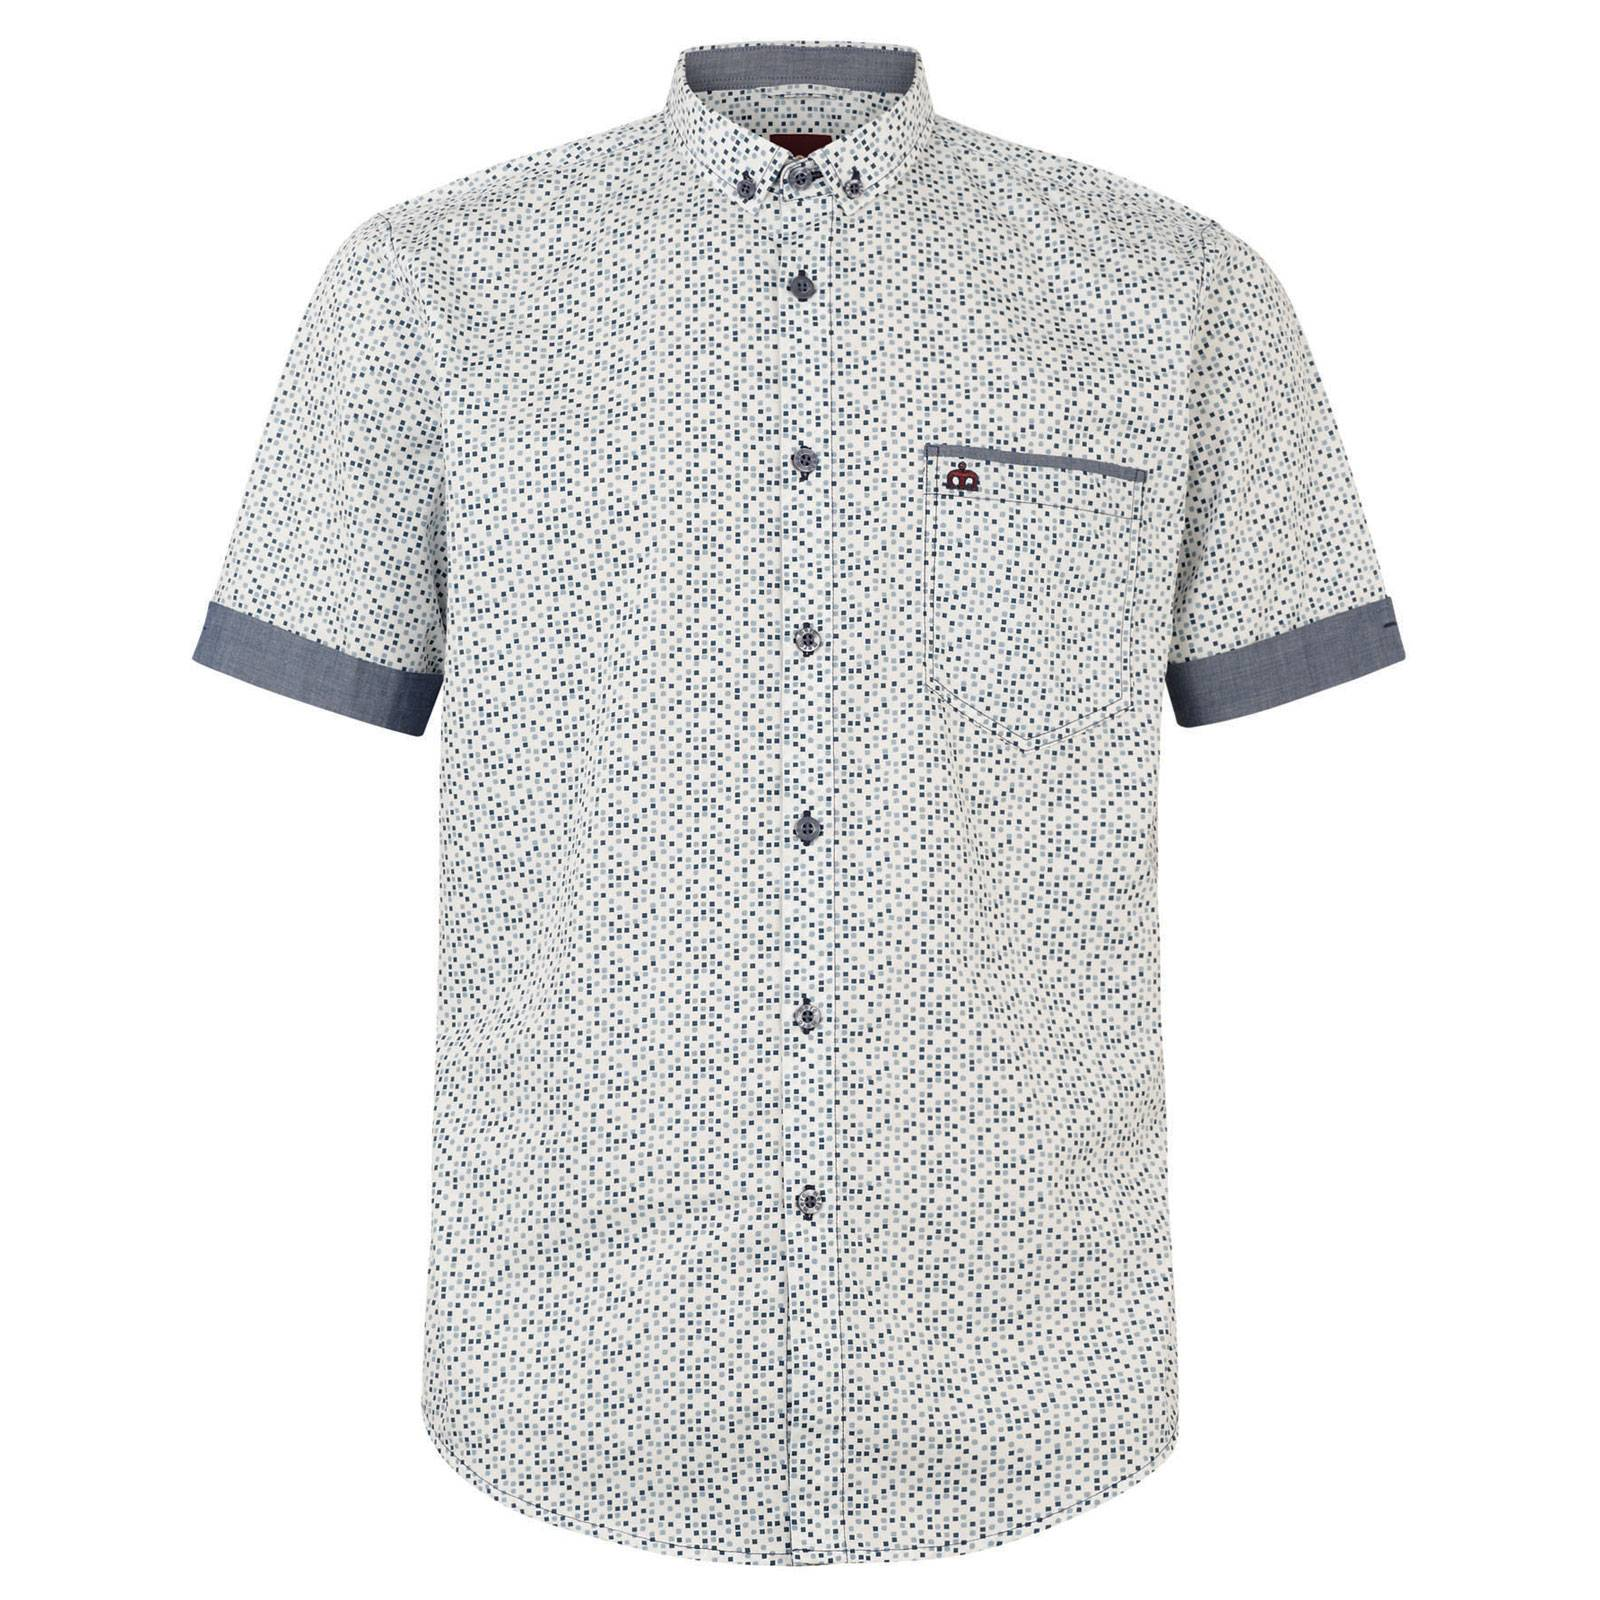 Рубашка OrvilleРубашки<br><br><br>Артикул: 1513104<br>Материал: 100% Хлопок<br>Цвет: белый<br>Пол: Мужской